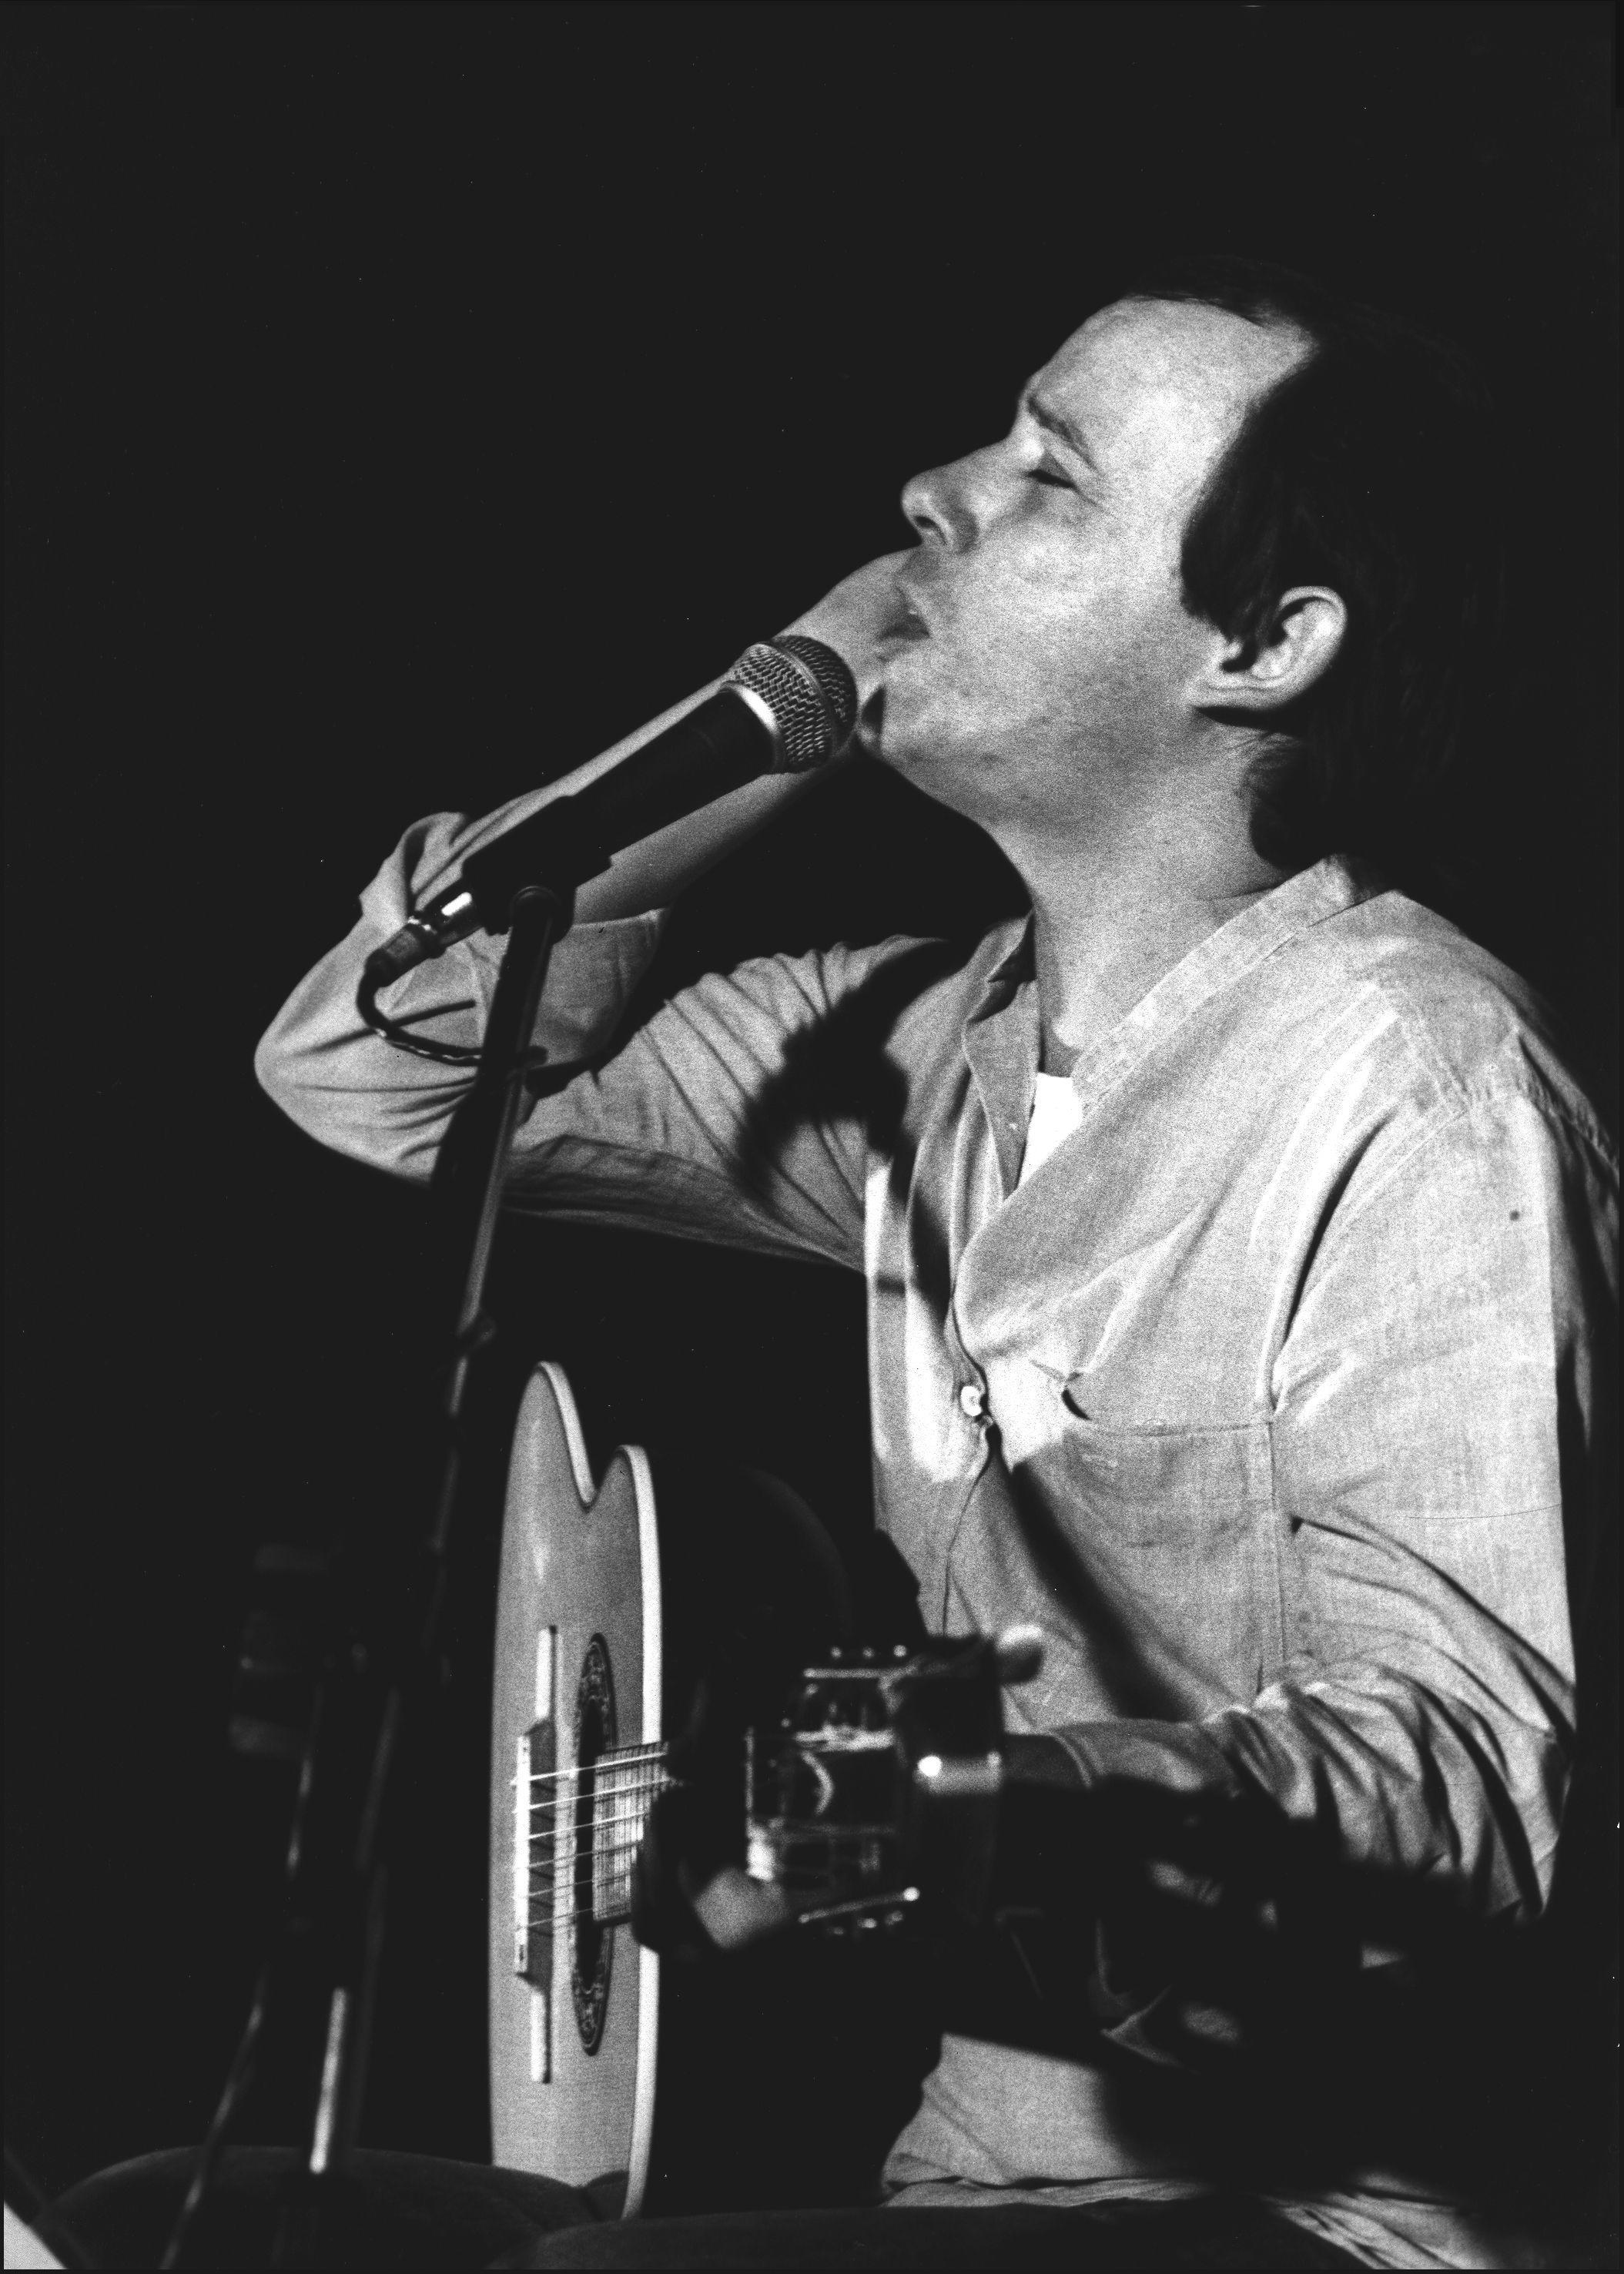 Silvio Rodríguez Retratos Famosos Foto Musica Cantautores